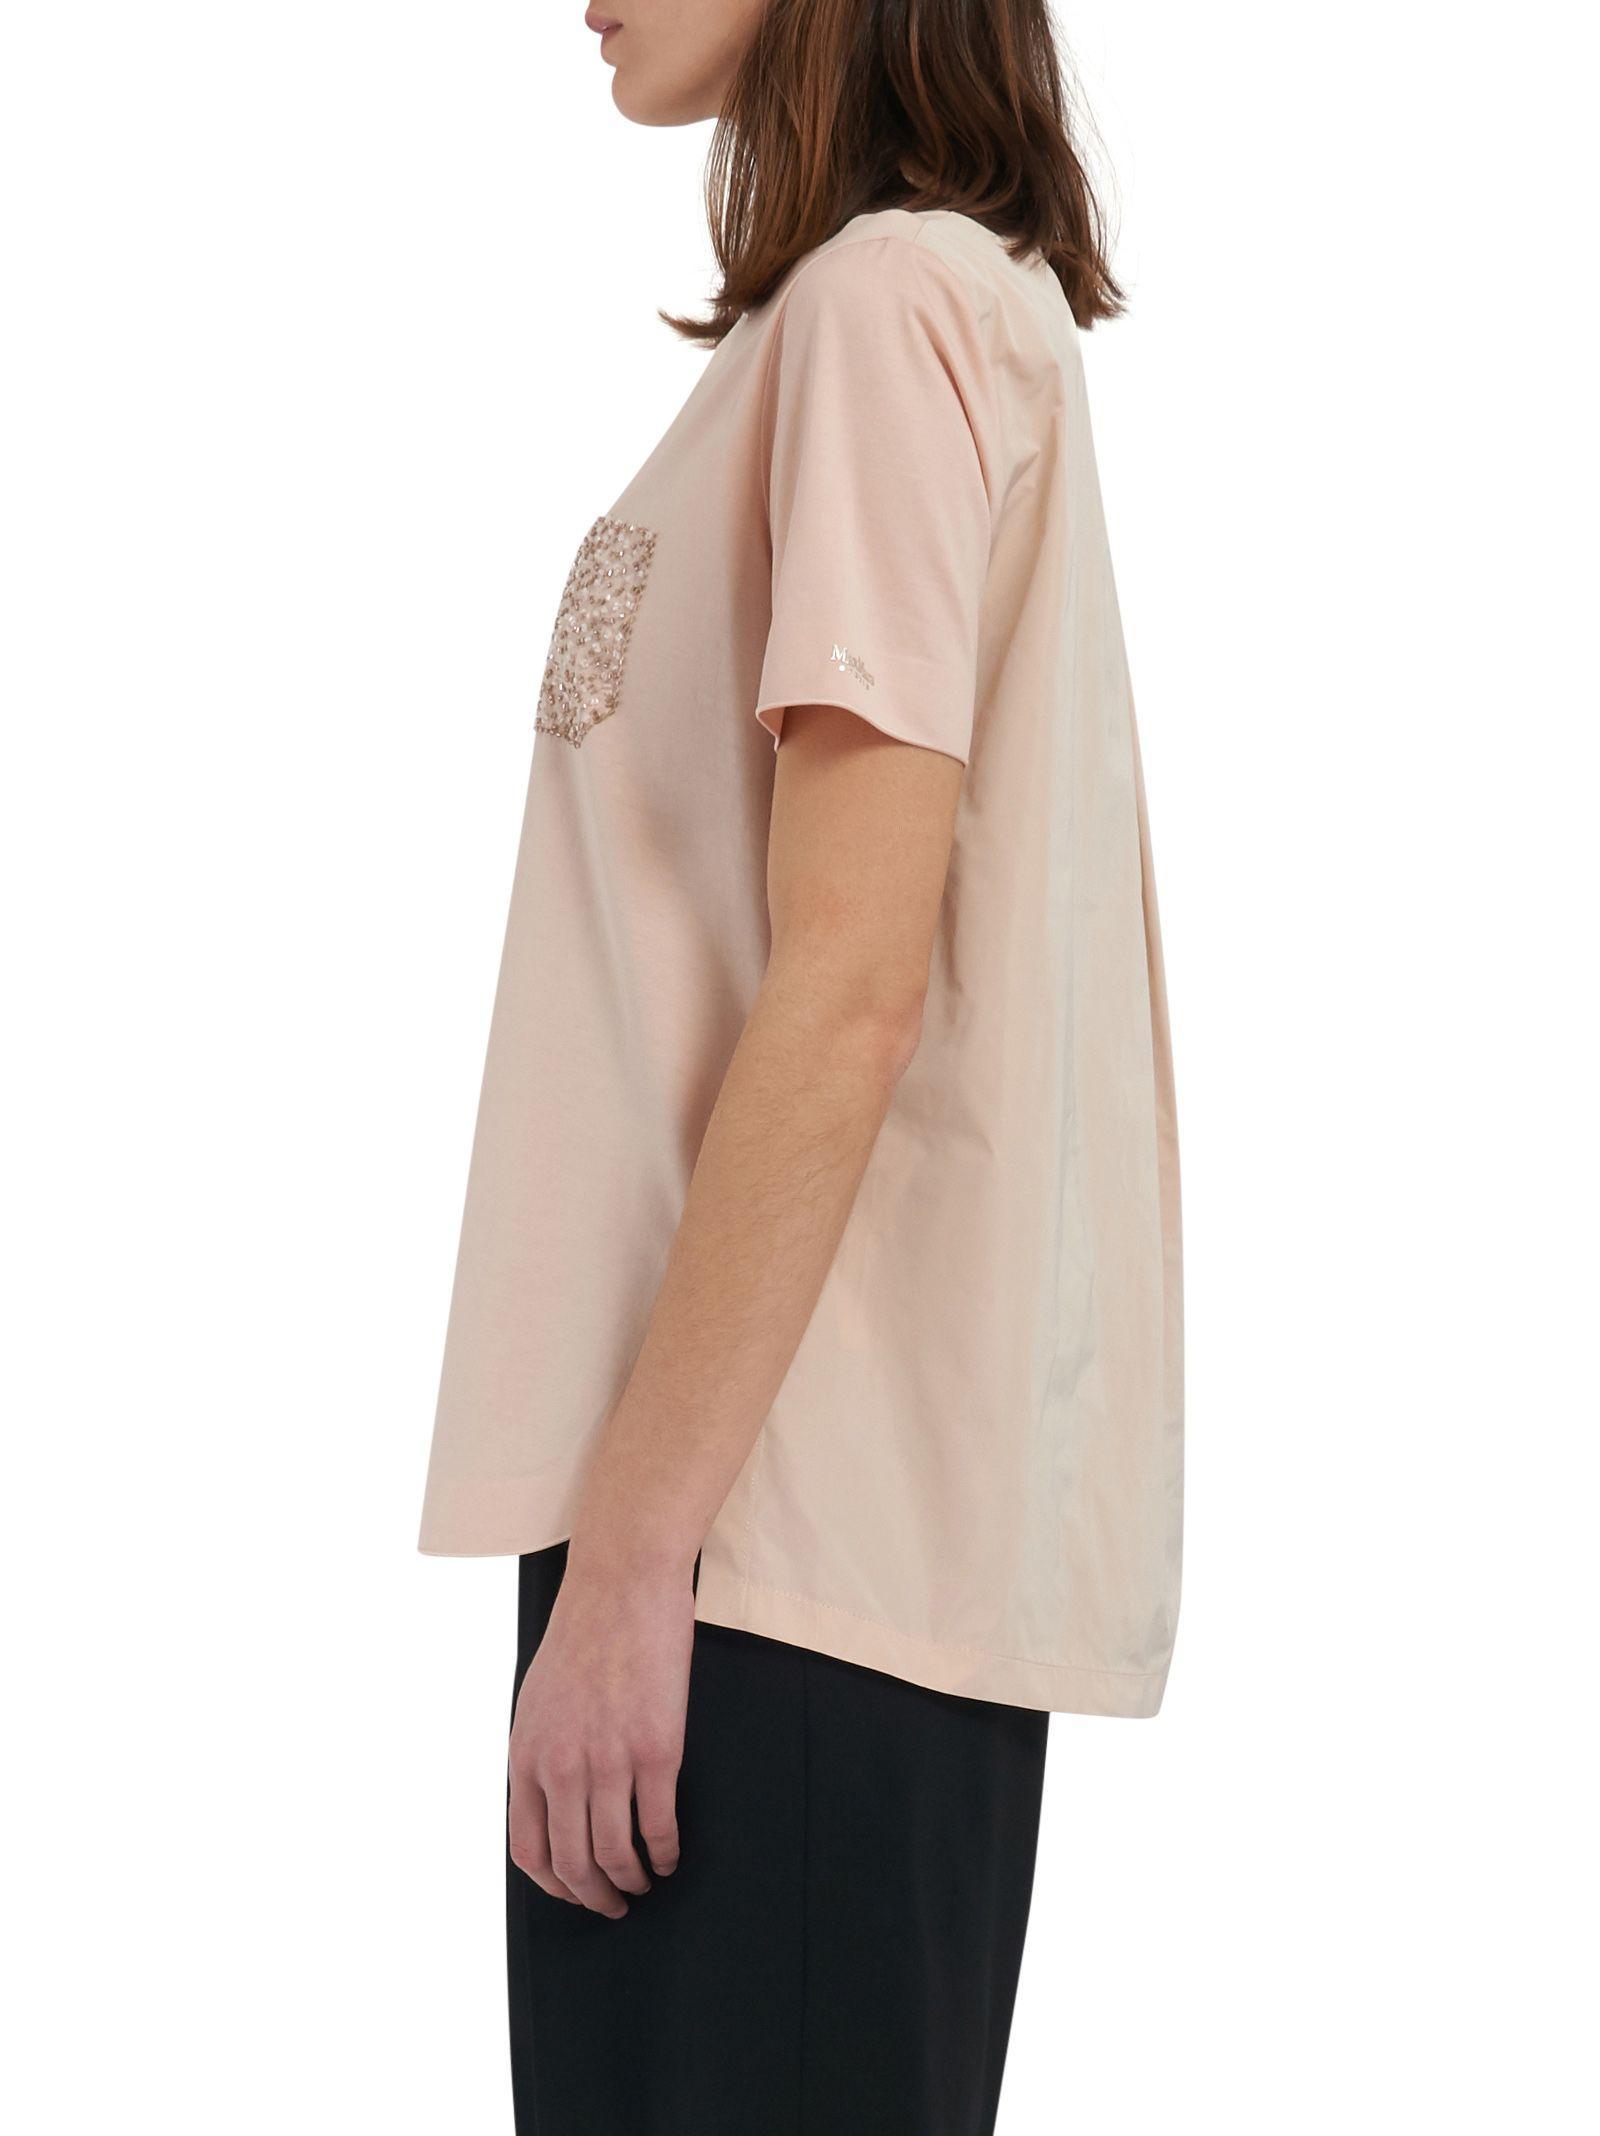 Max Mara Maxmara Studio T-shirt In Pink